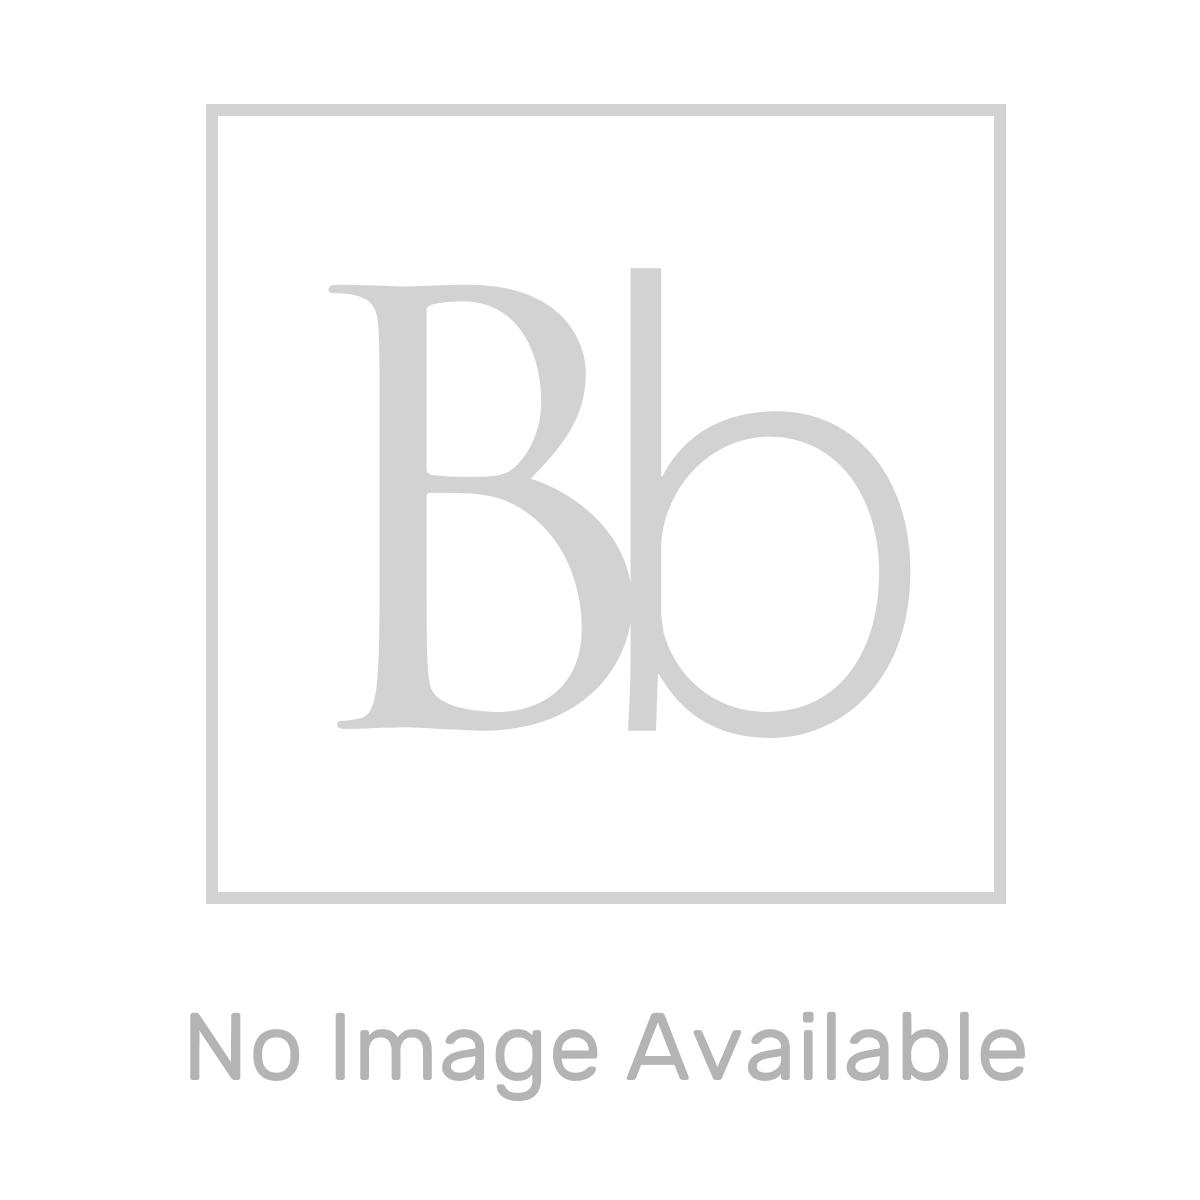 Stuart Turner 46556 CH 4-60 Centrifugal Multistage 6.0 Bar Pump